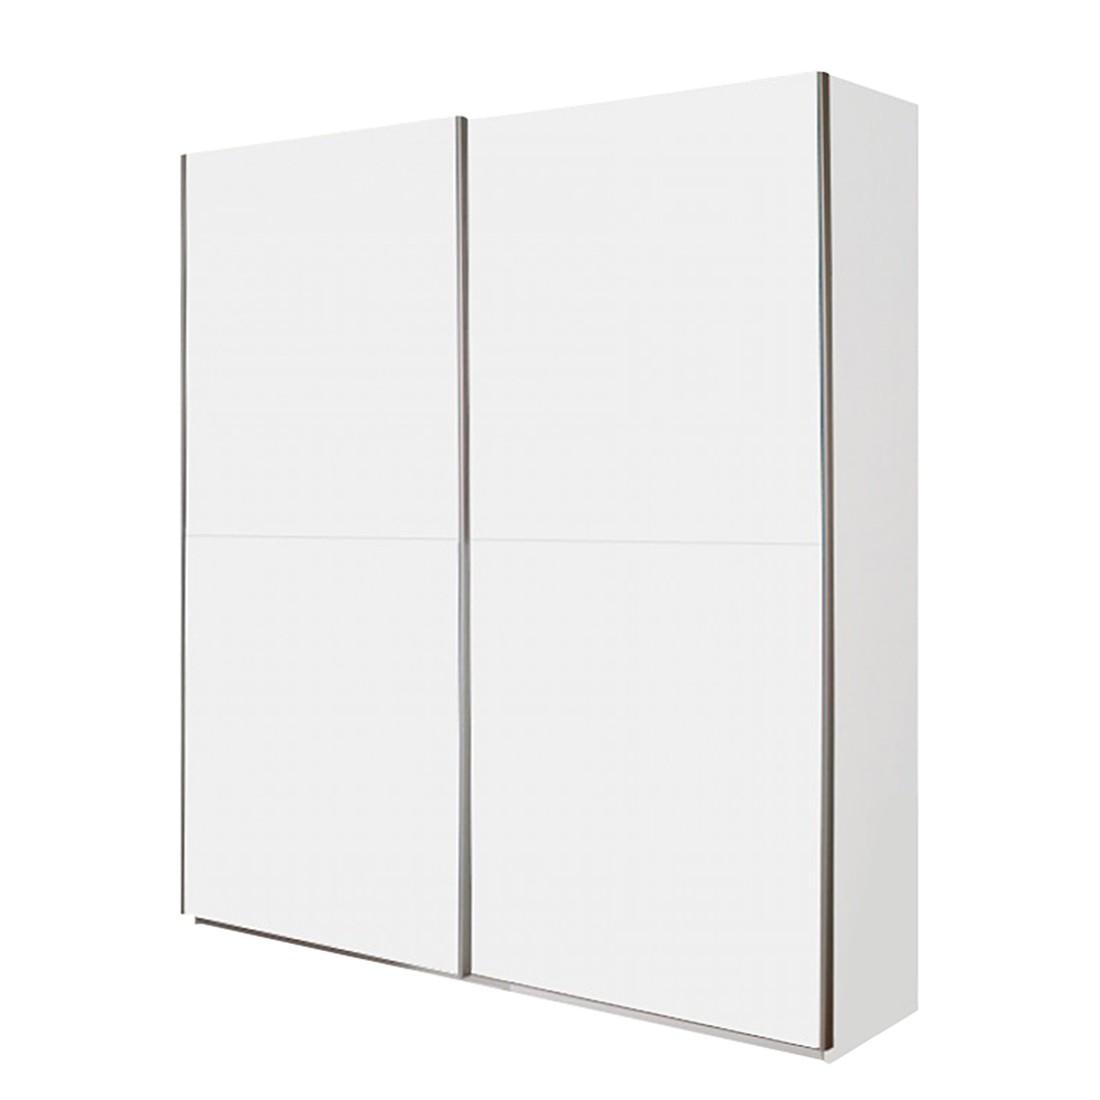 Armoire à portes coulissantes Subito - Blanc alpin, Rauch Packs